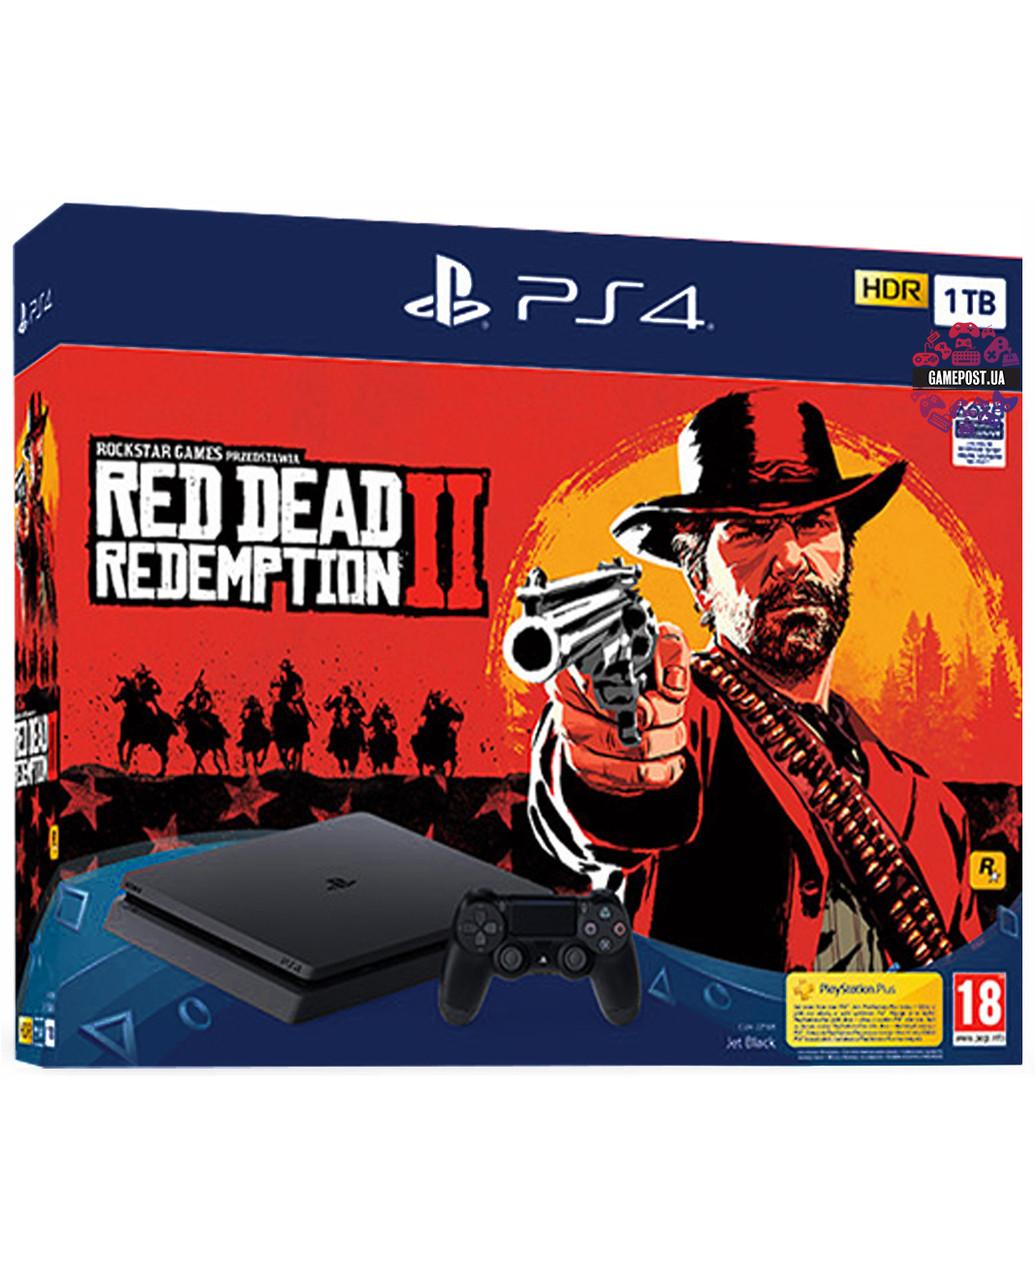 Playstation 4 Slim 1Tb + игра Red Dead Redemption 2Нет в наличии